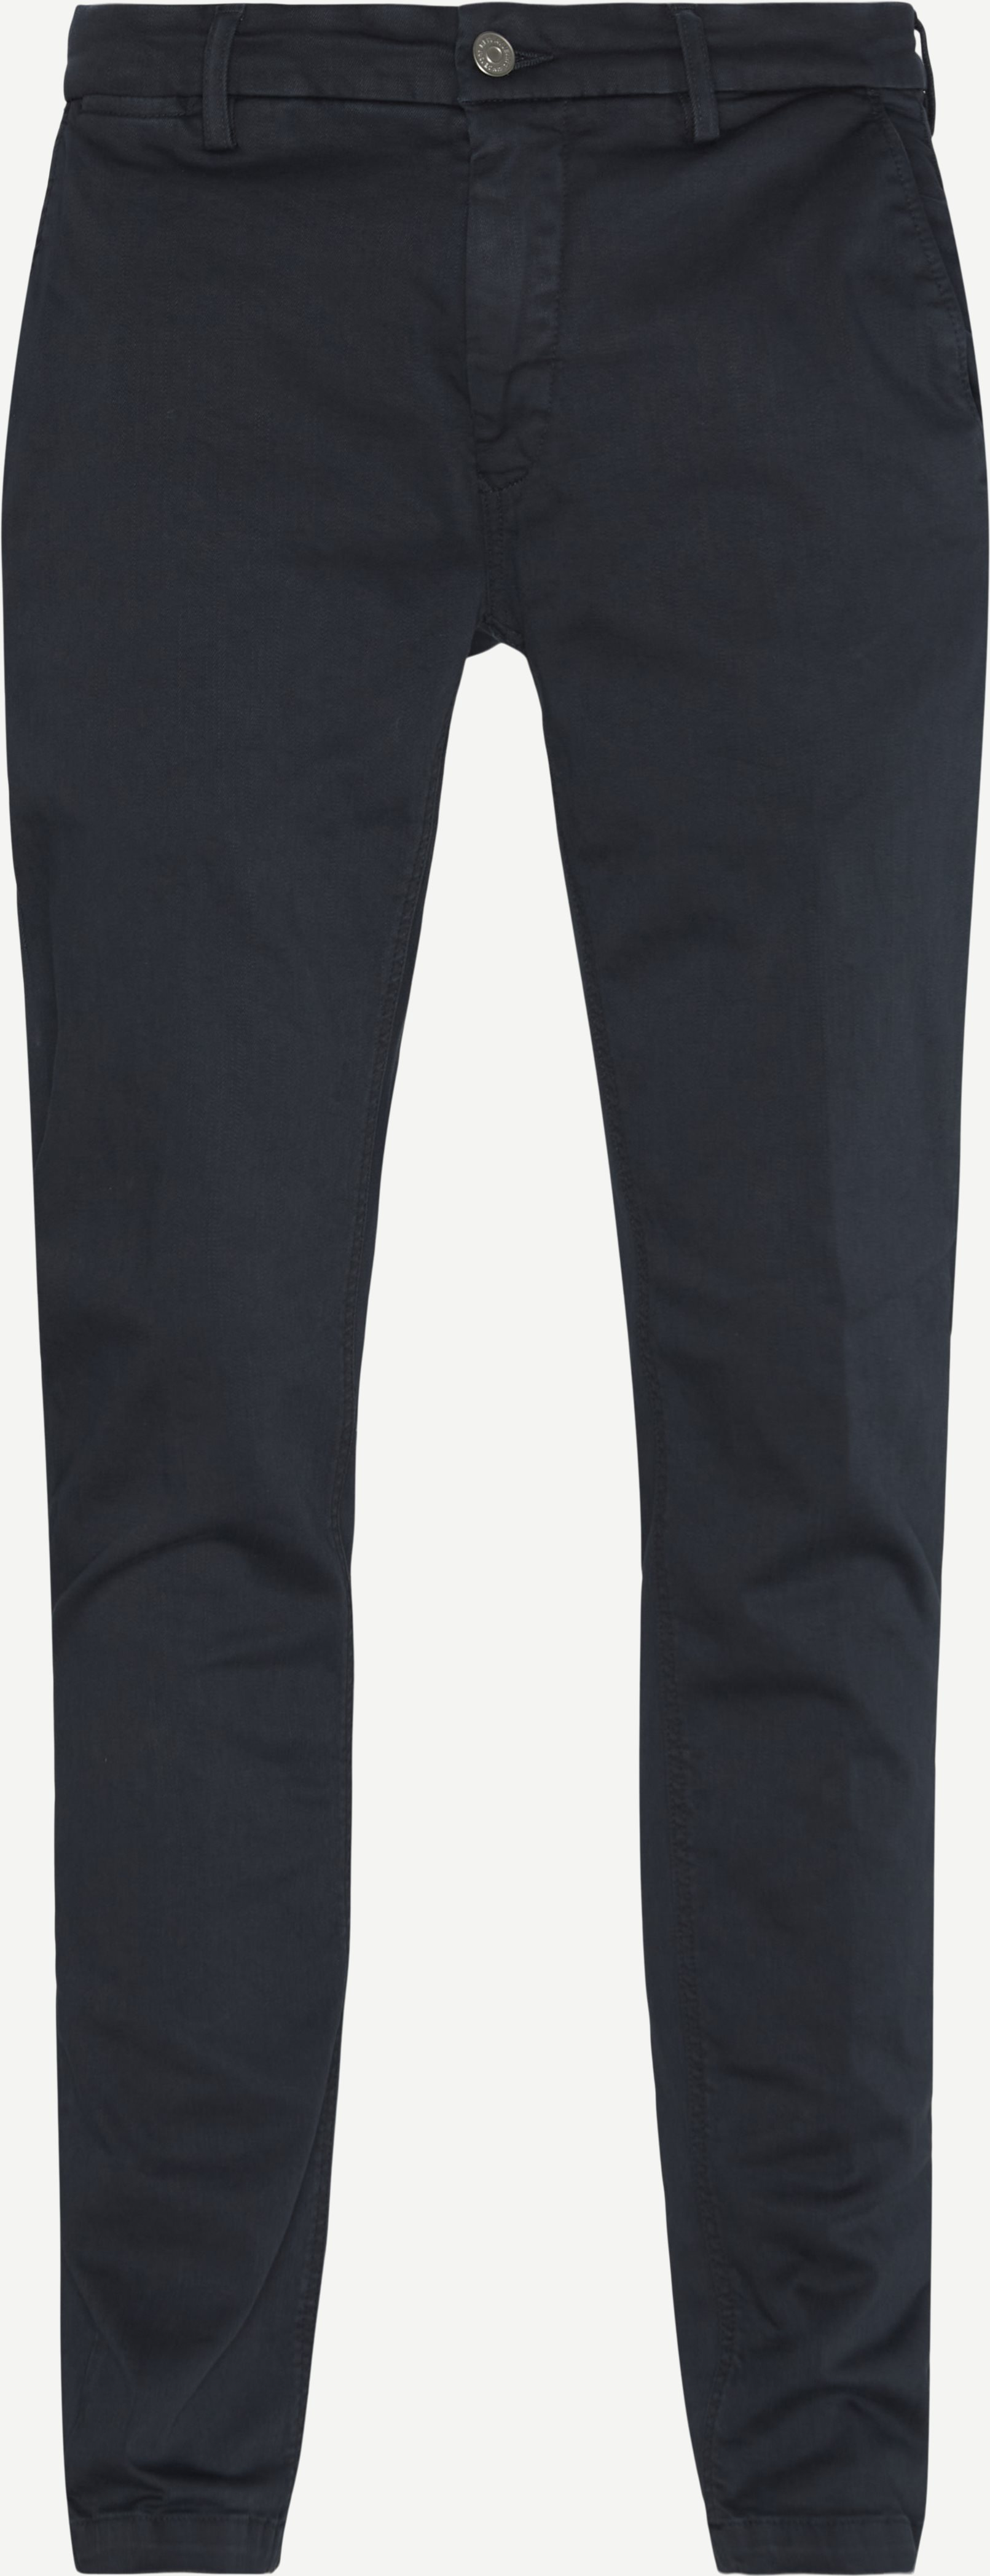 Hosen - Blau